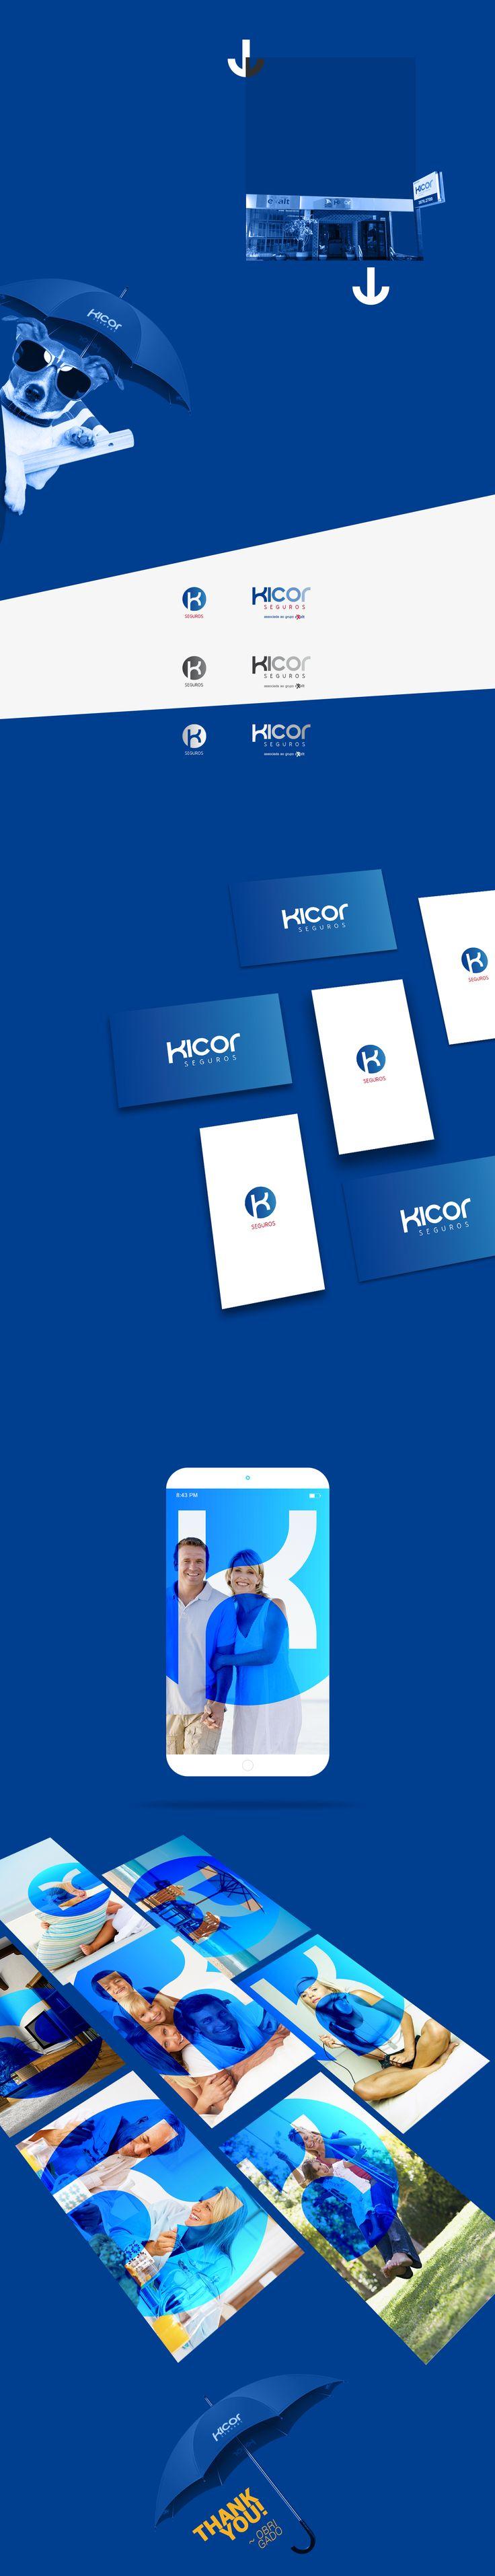 Visual Identity development for Insurance Company Kicor Vinhedo São Paulo - Brasil.